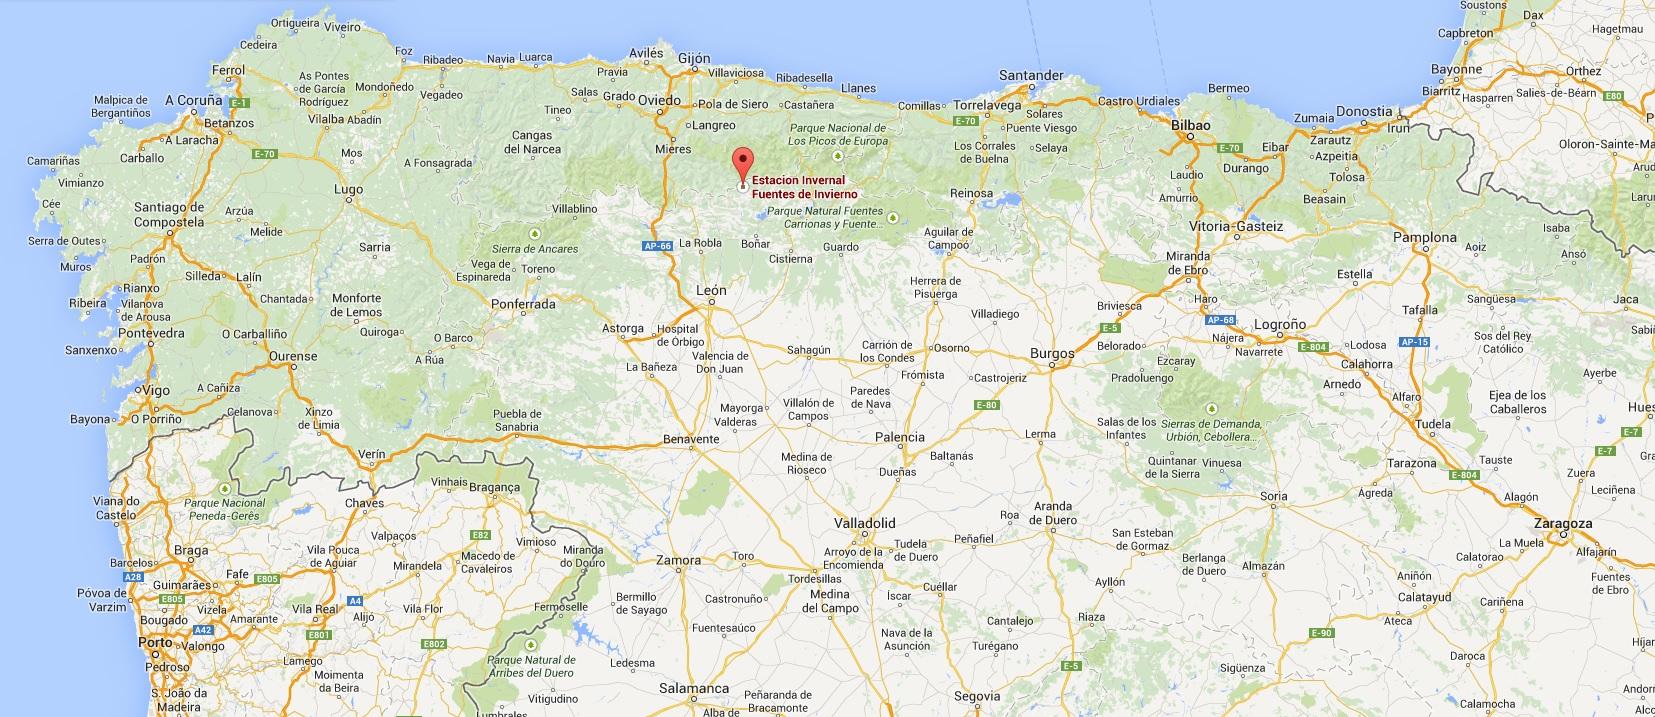 Carte Espagne Gijon.Ski En Cantabrie Proche De La Corogne Gijon Et Santander